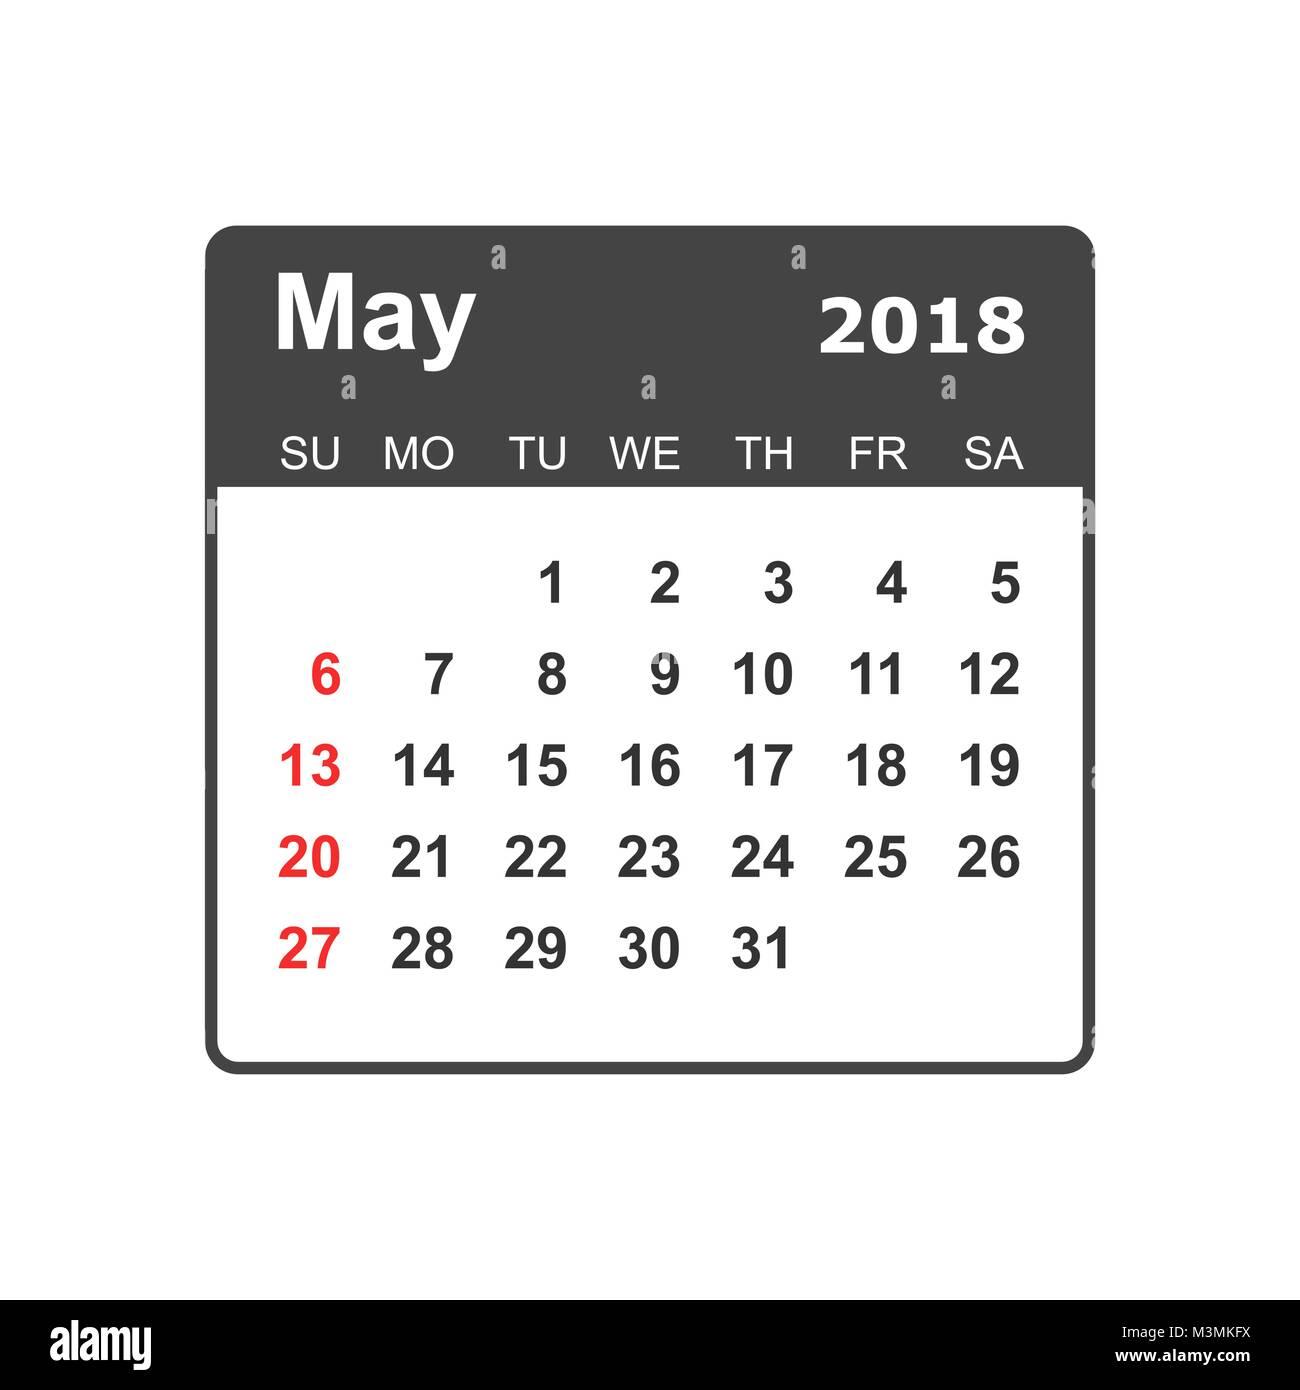 may 2018 calendar calendar planner design template week starts on sunday business vector illustration